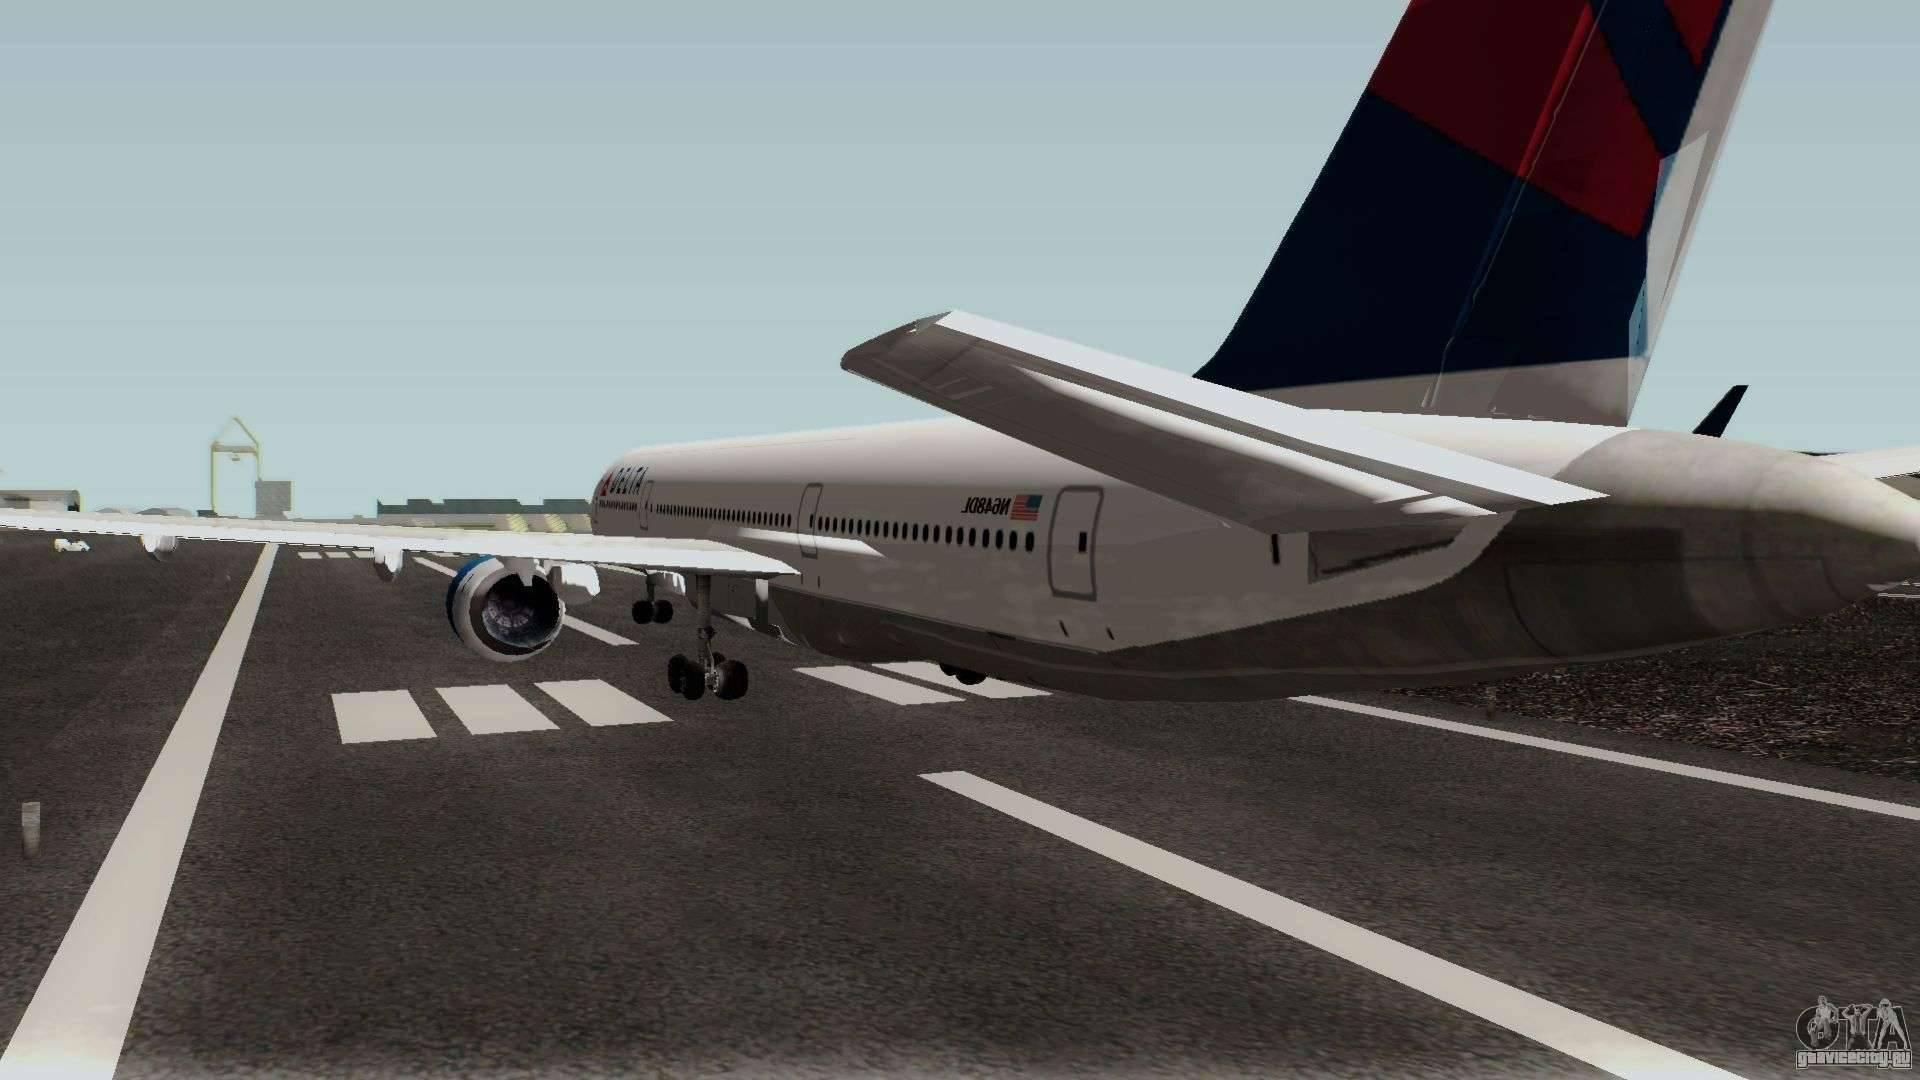 Боинг 757-200 википедия